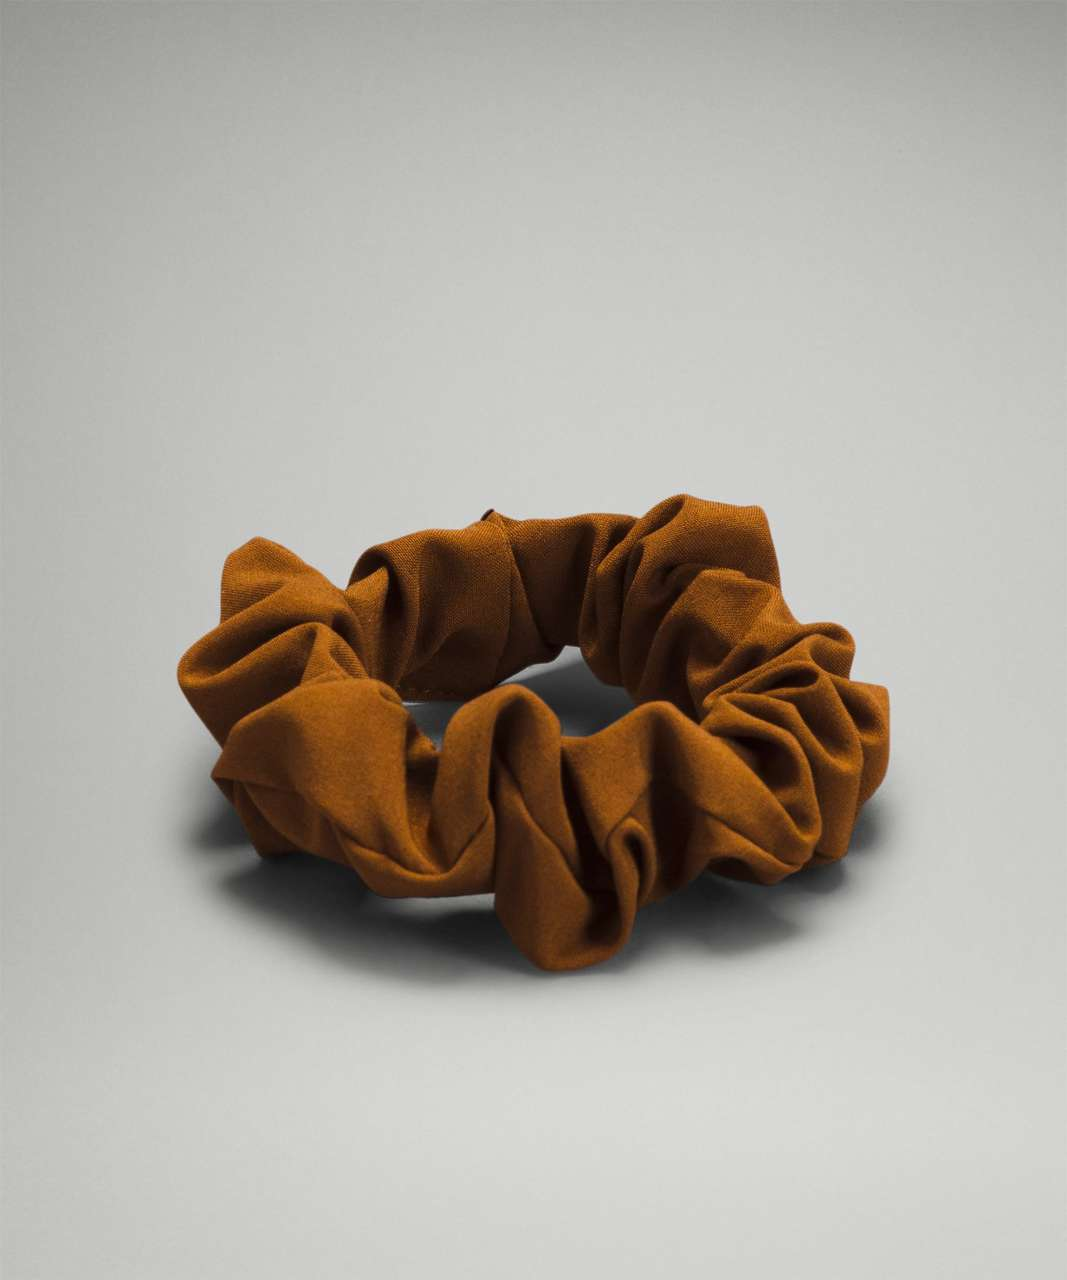 Lululemon Uplifting Scrunchie - Copper Brown